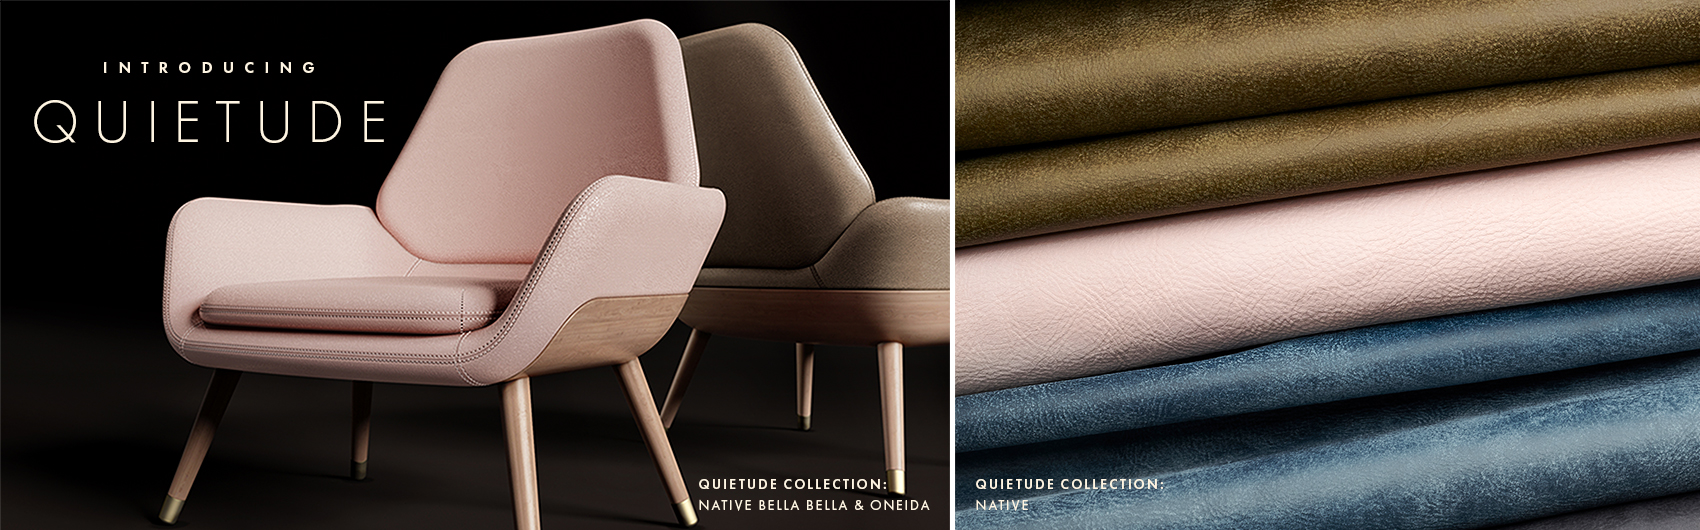 Quietude Chair